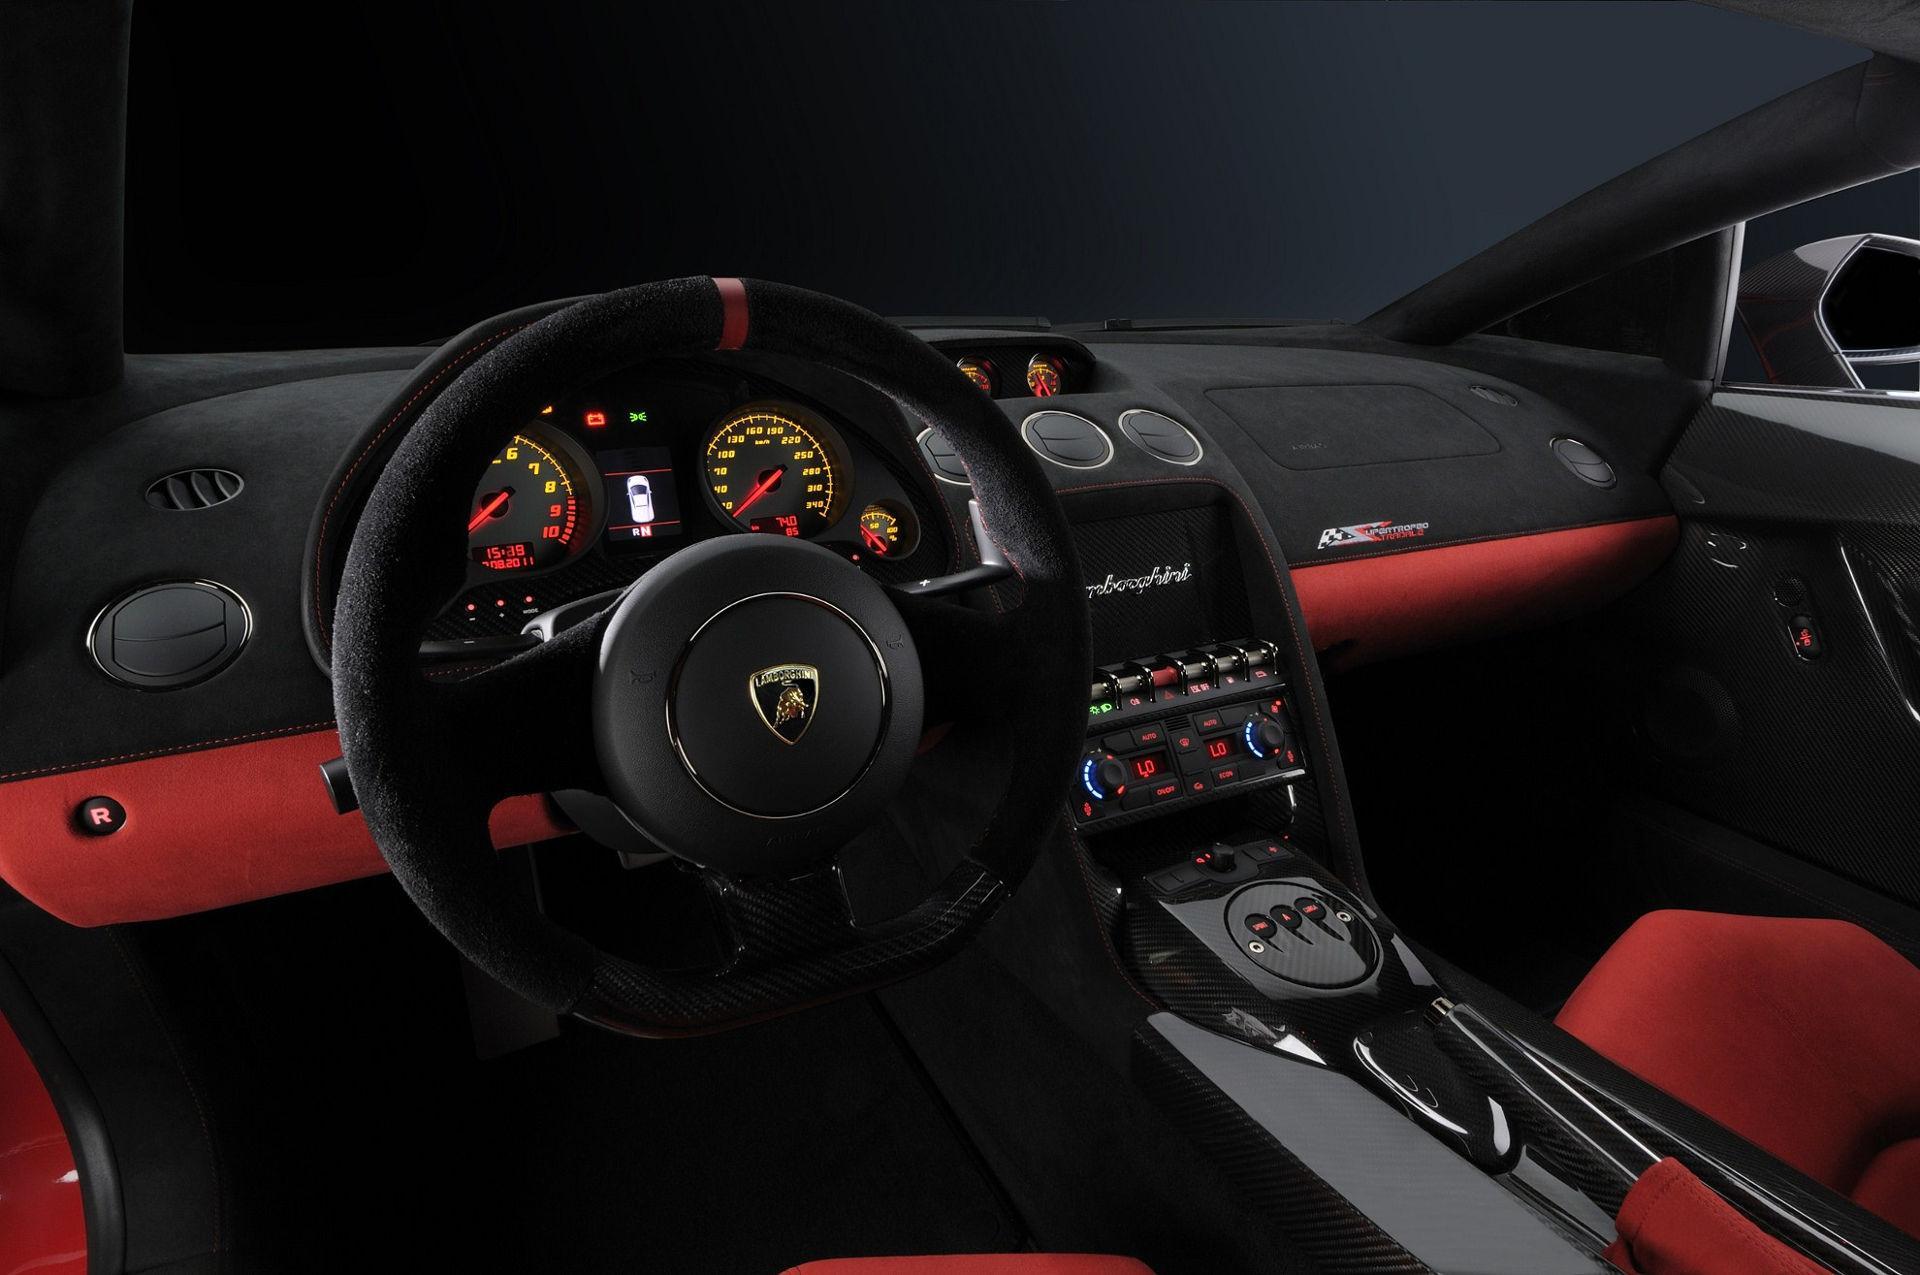 Lamborghini Gallardo LP 570-4 Super Trofeo Stradale - Innenraum